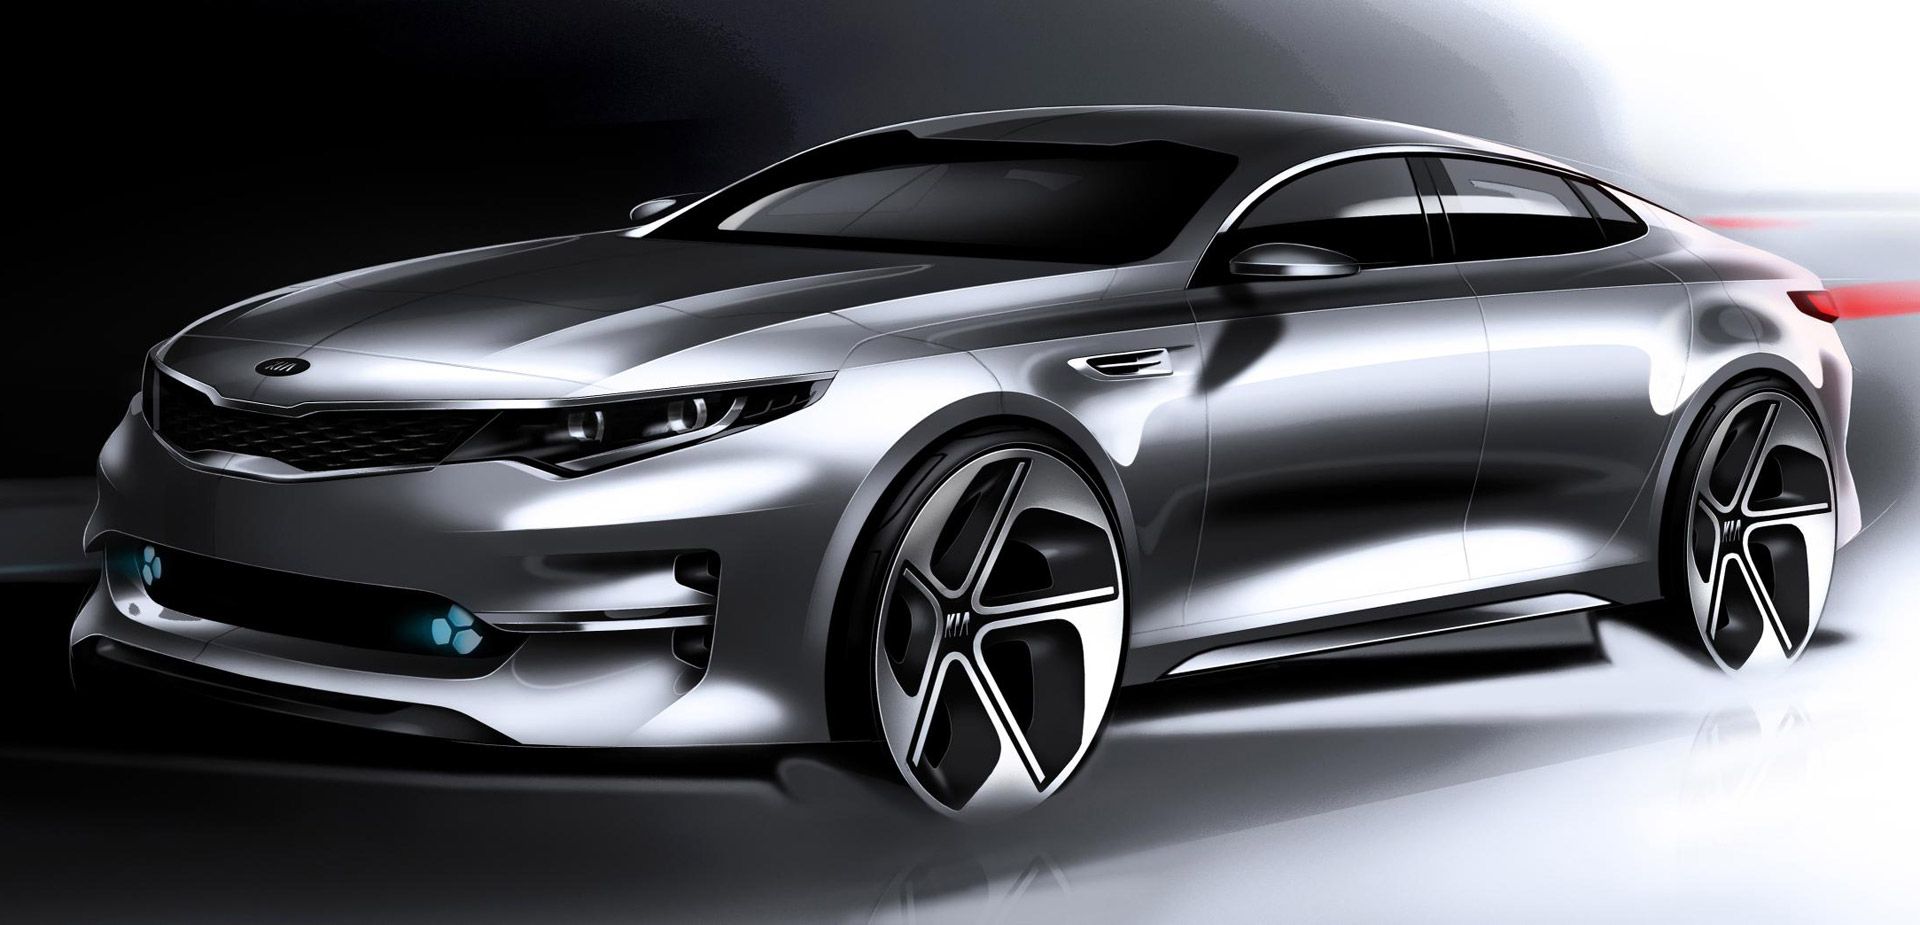 2016 kia optima teased ahead of 2015 new york auto show. Black Bedroom Furniture Sets. Home Design Ideas